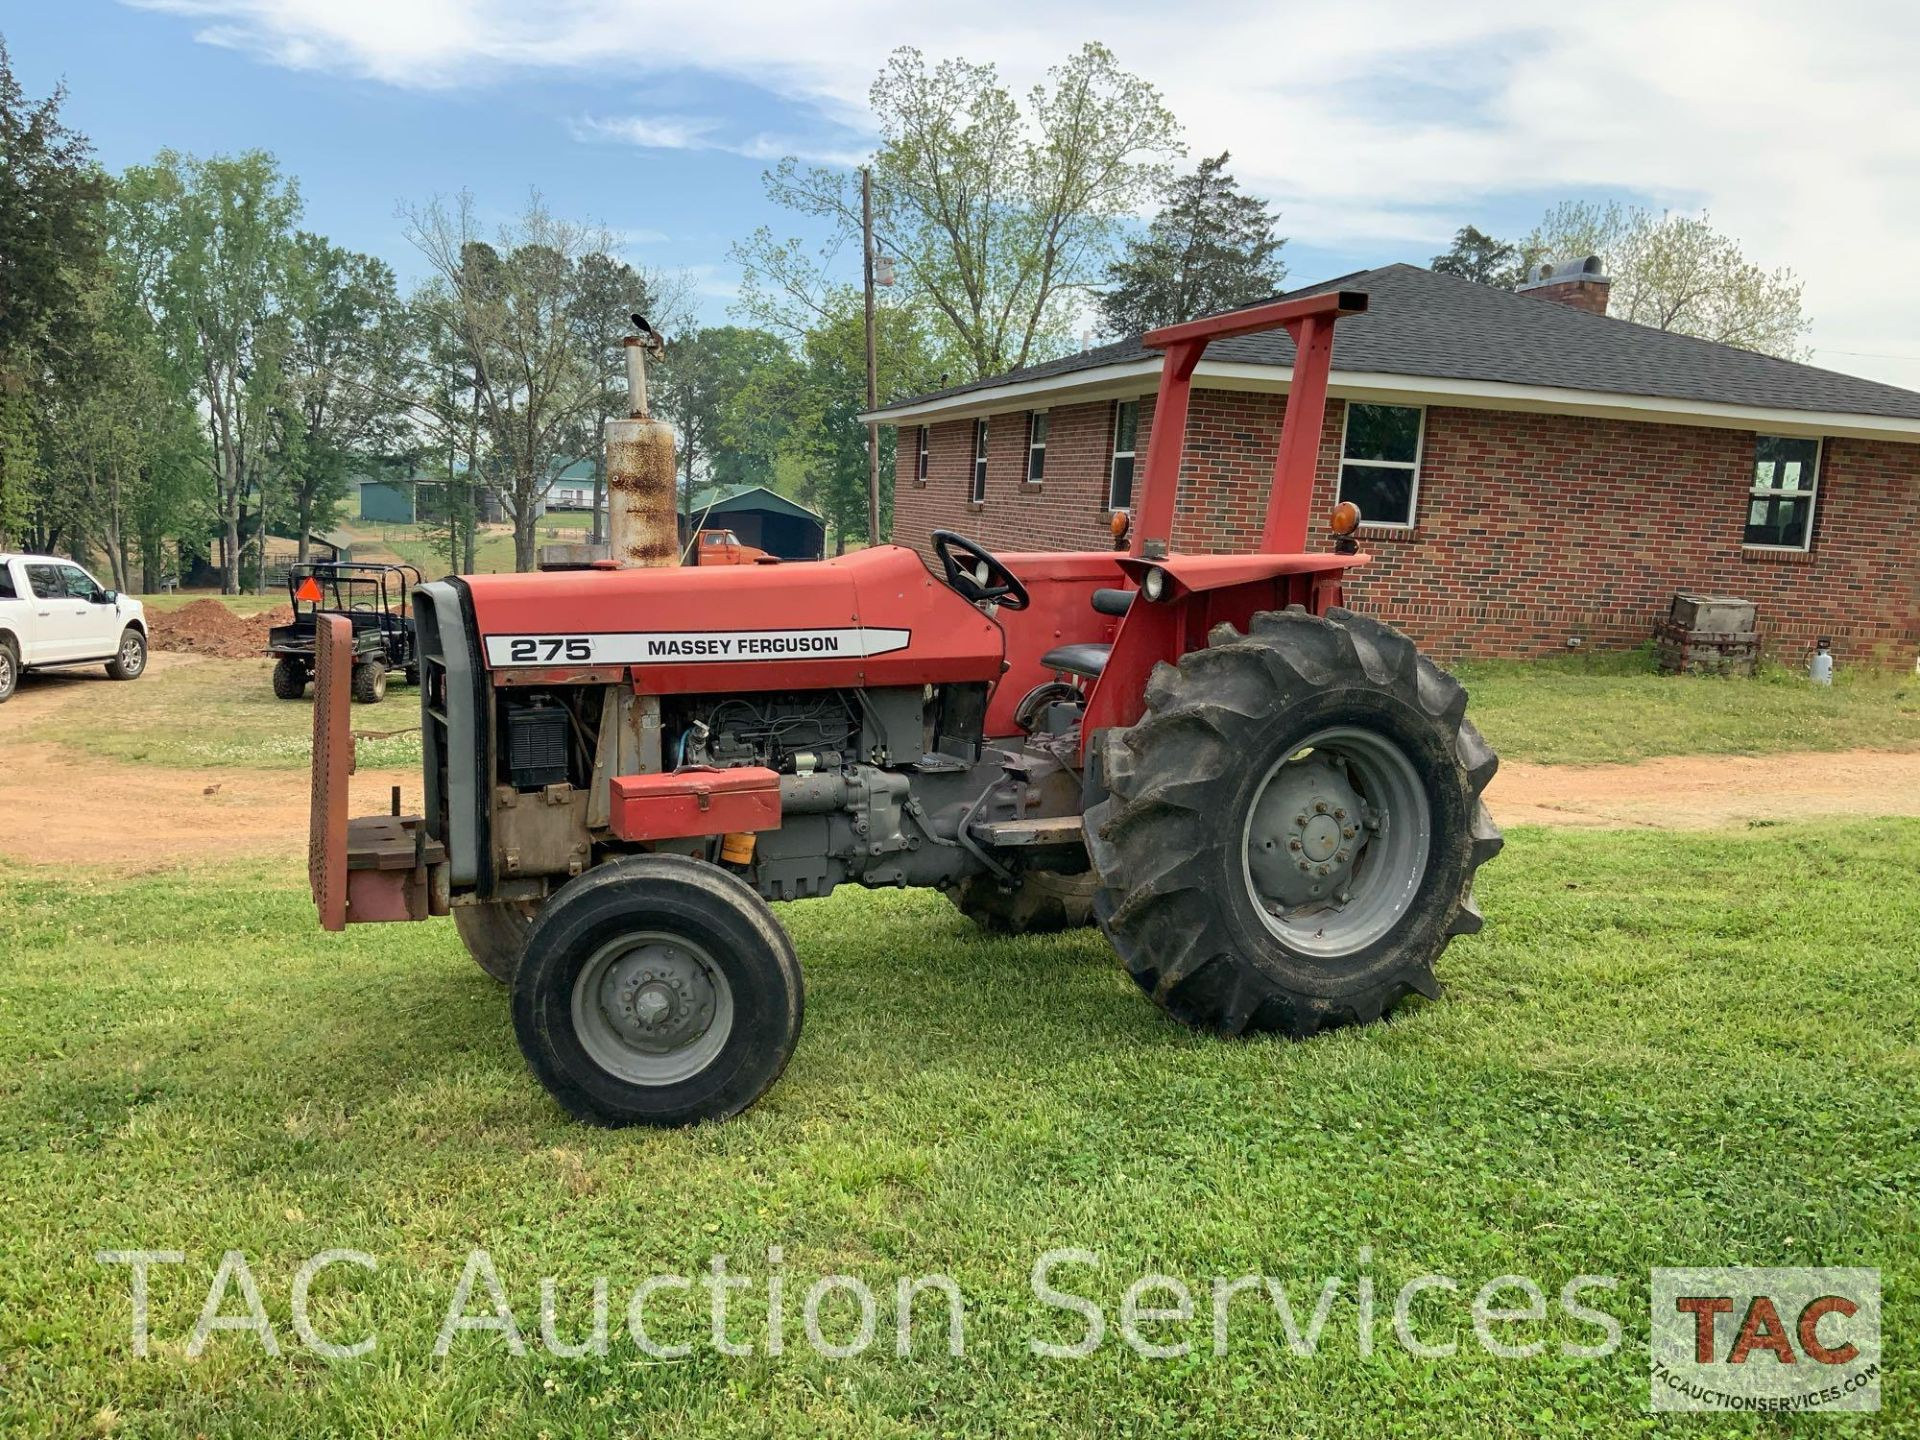 Massey Ferguson 275 Farm Tractor - Image 2 of 25